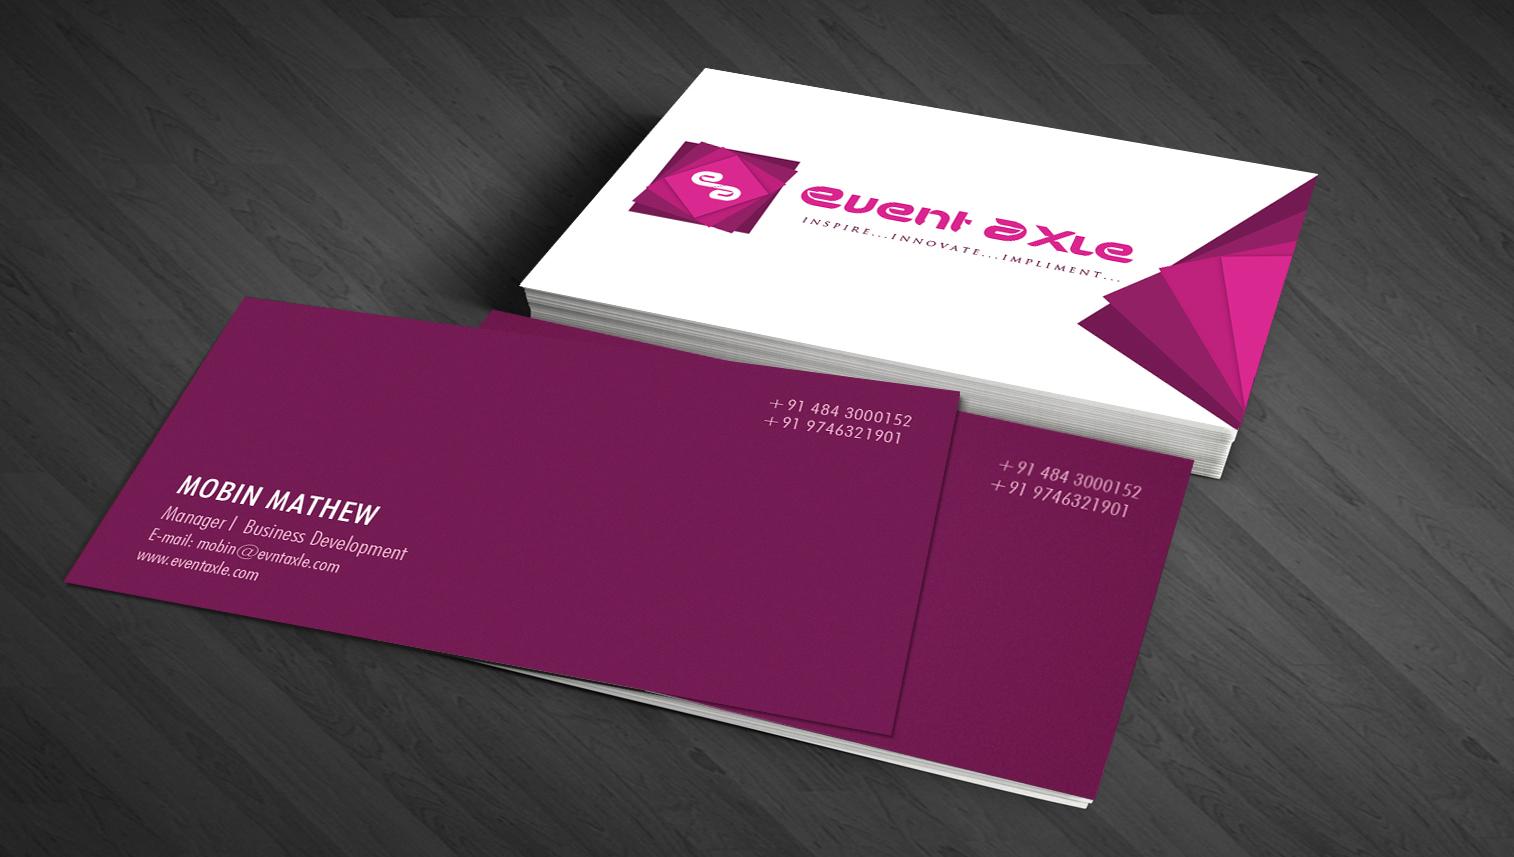 Libin cherian freelance graphic web designer from kerala business card designs reheart Choice Image